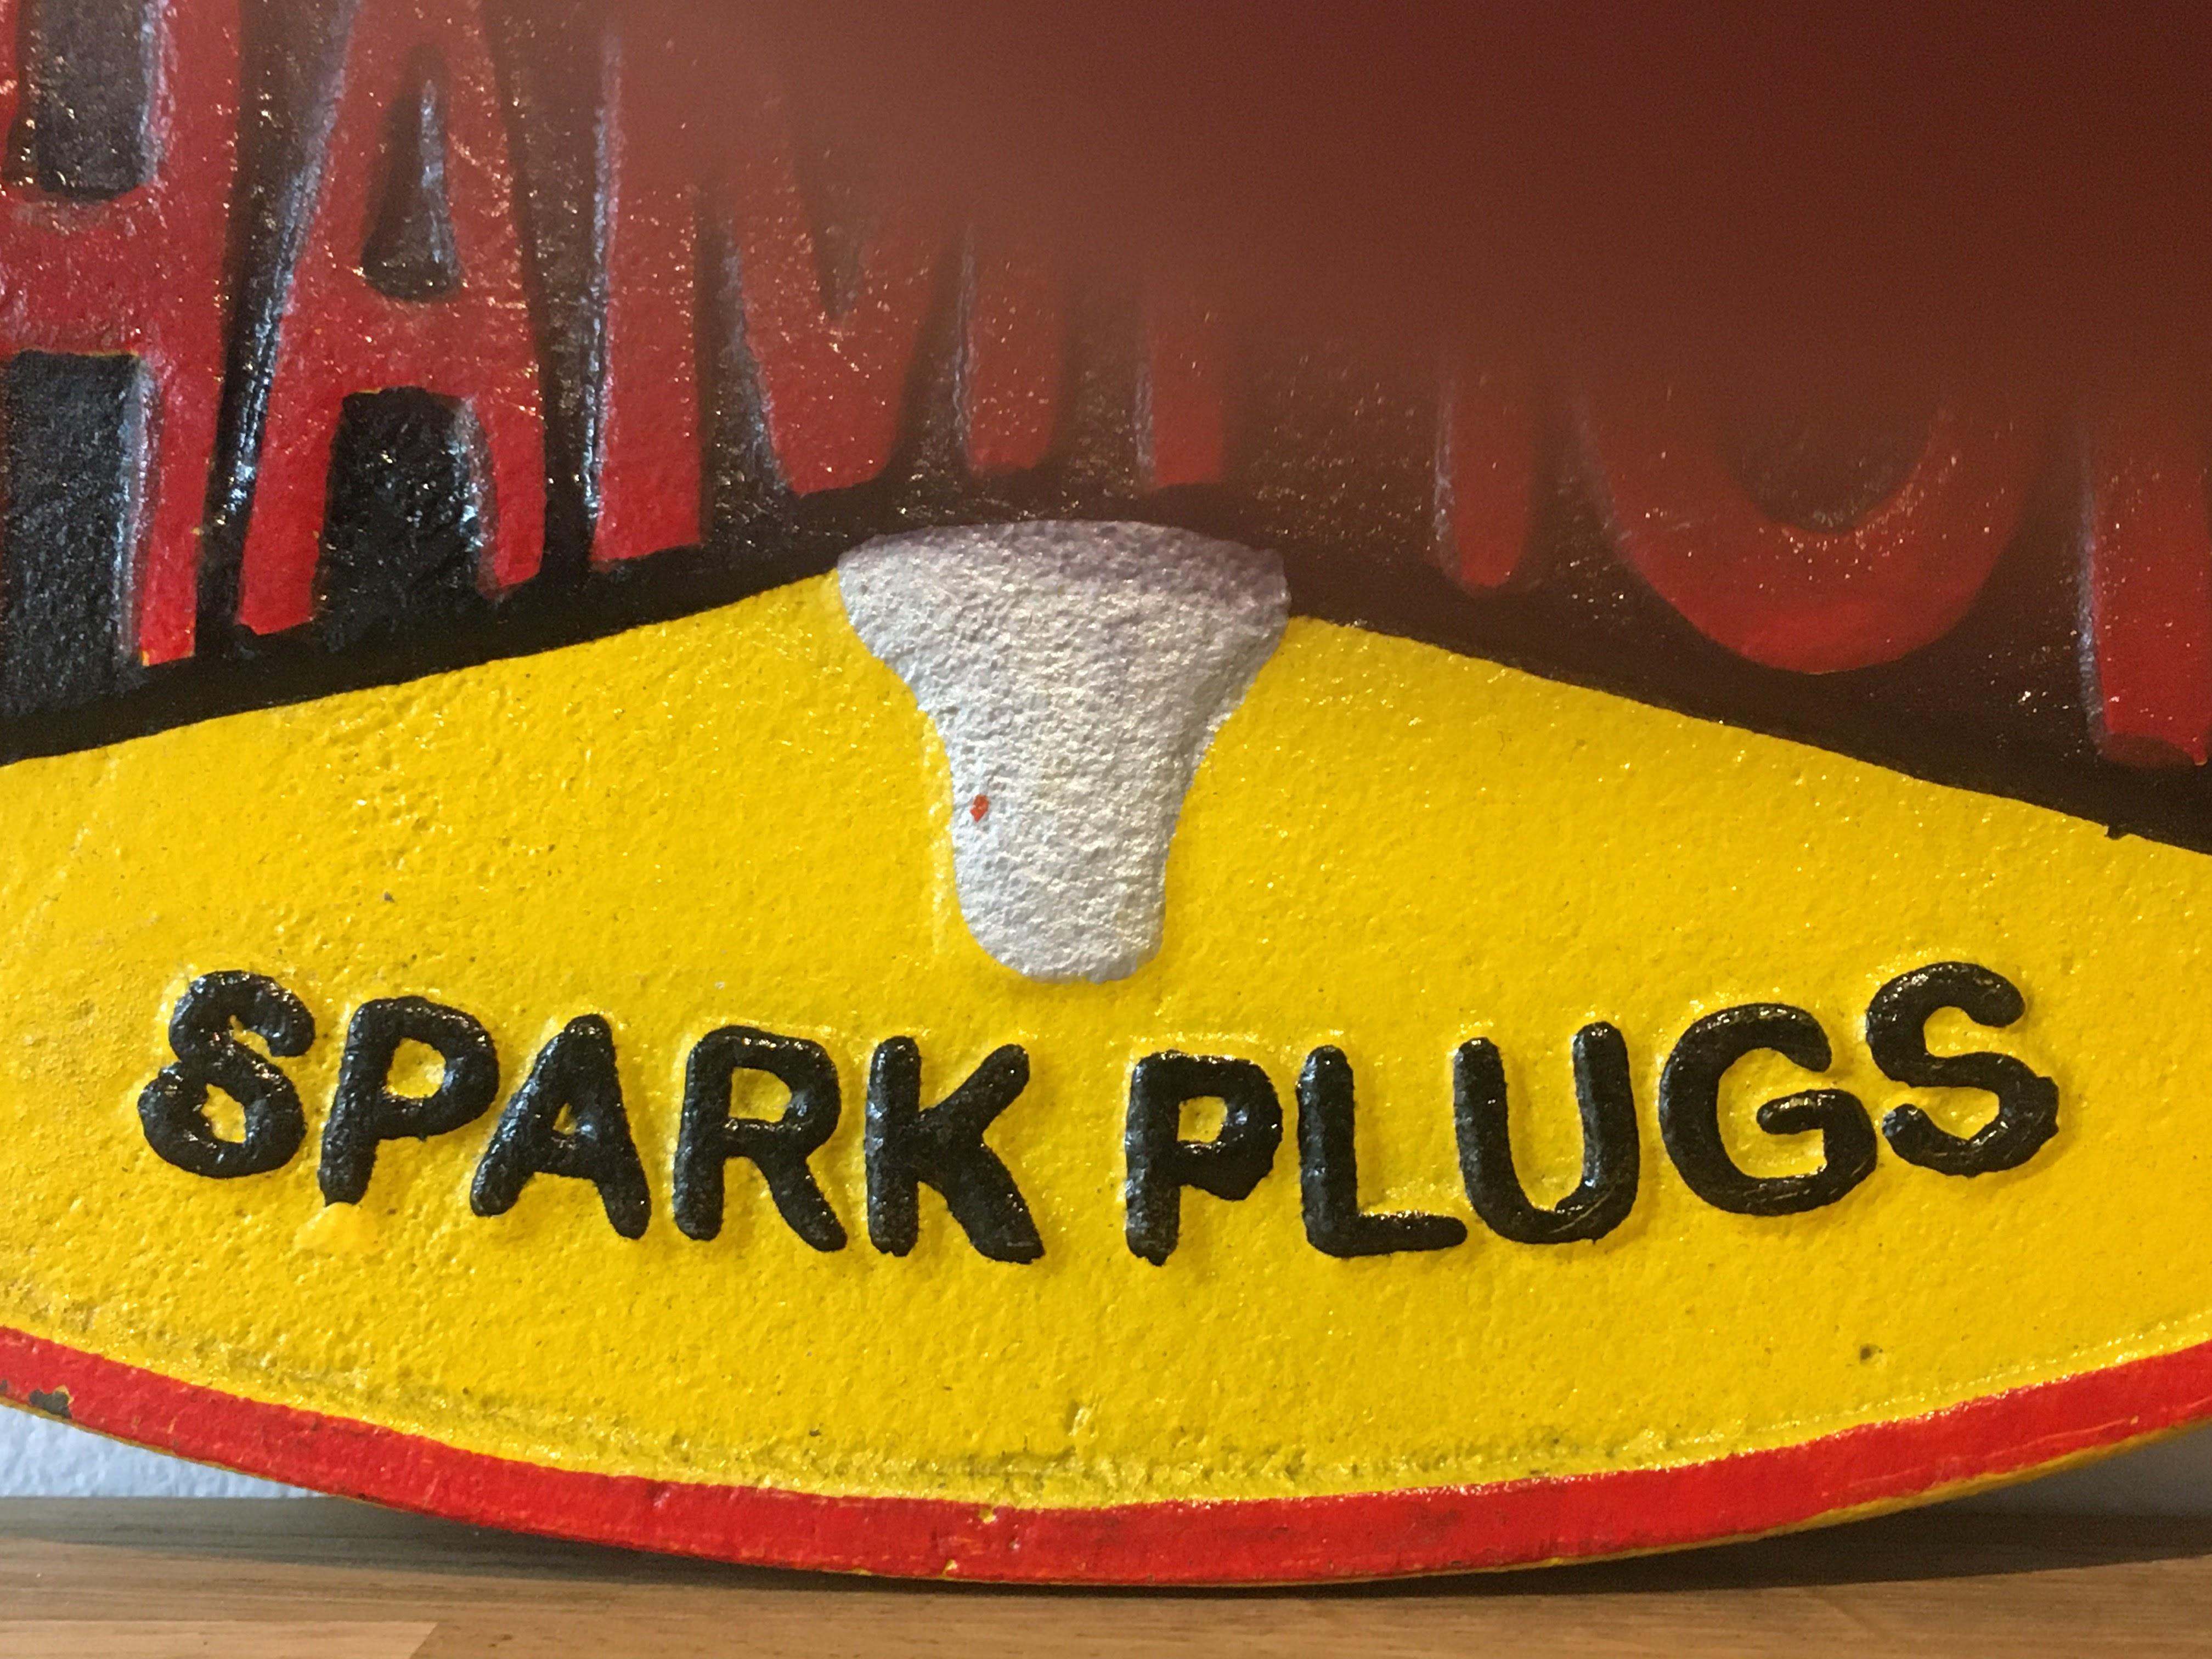 Champion 'Spark Plugs' Cast Iron Sign - Image 3 of 6